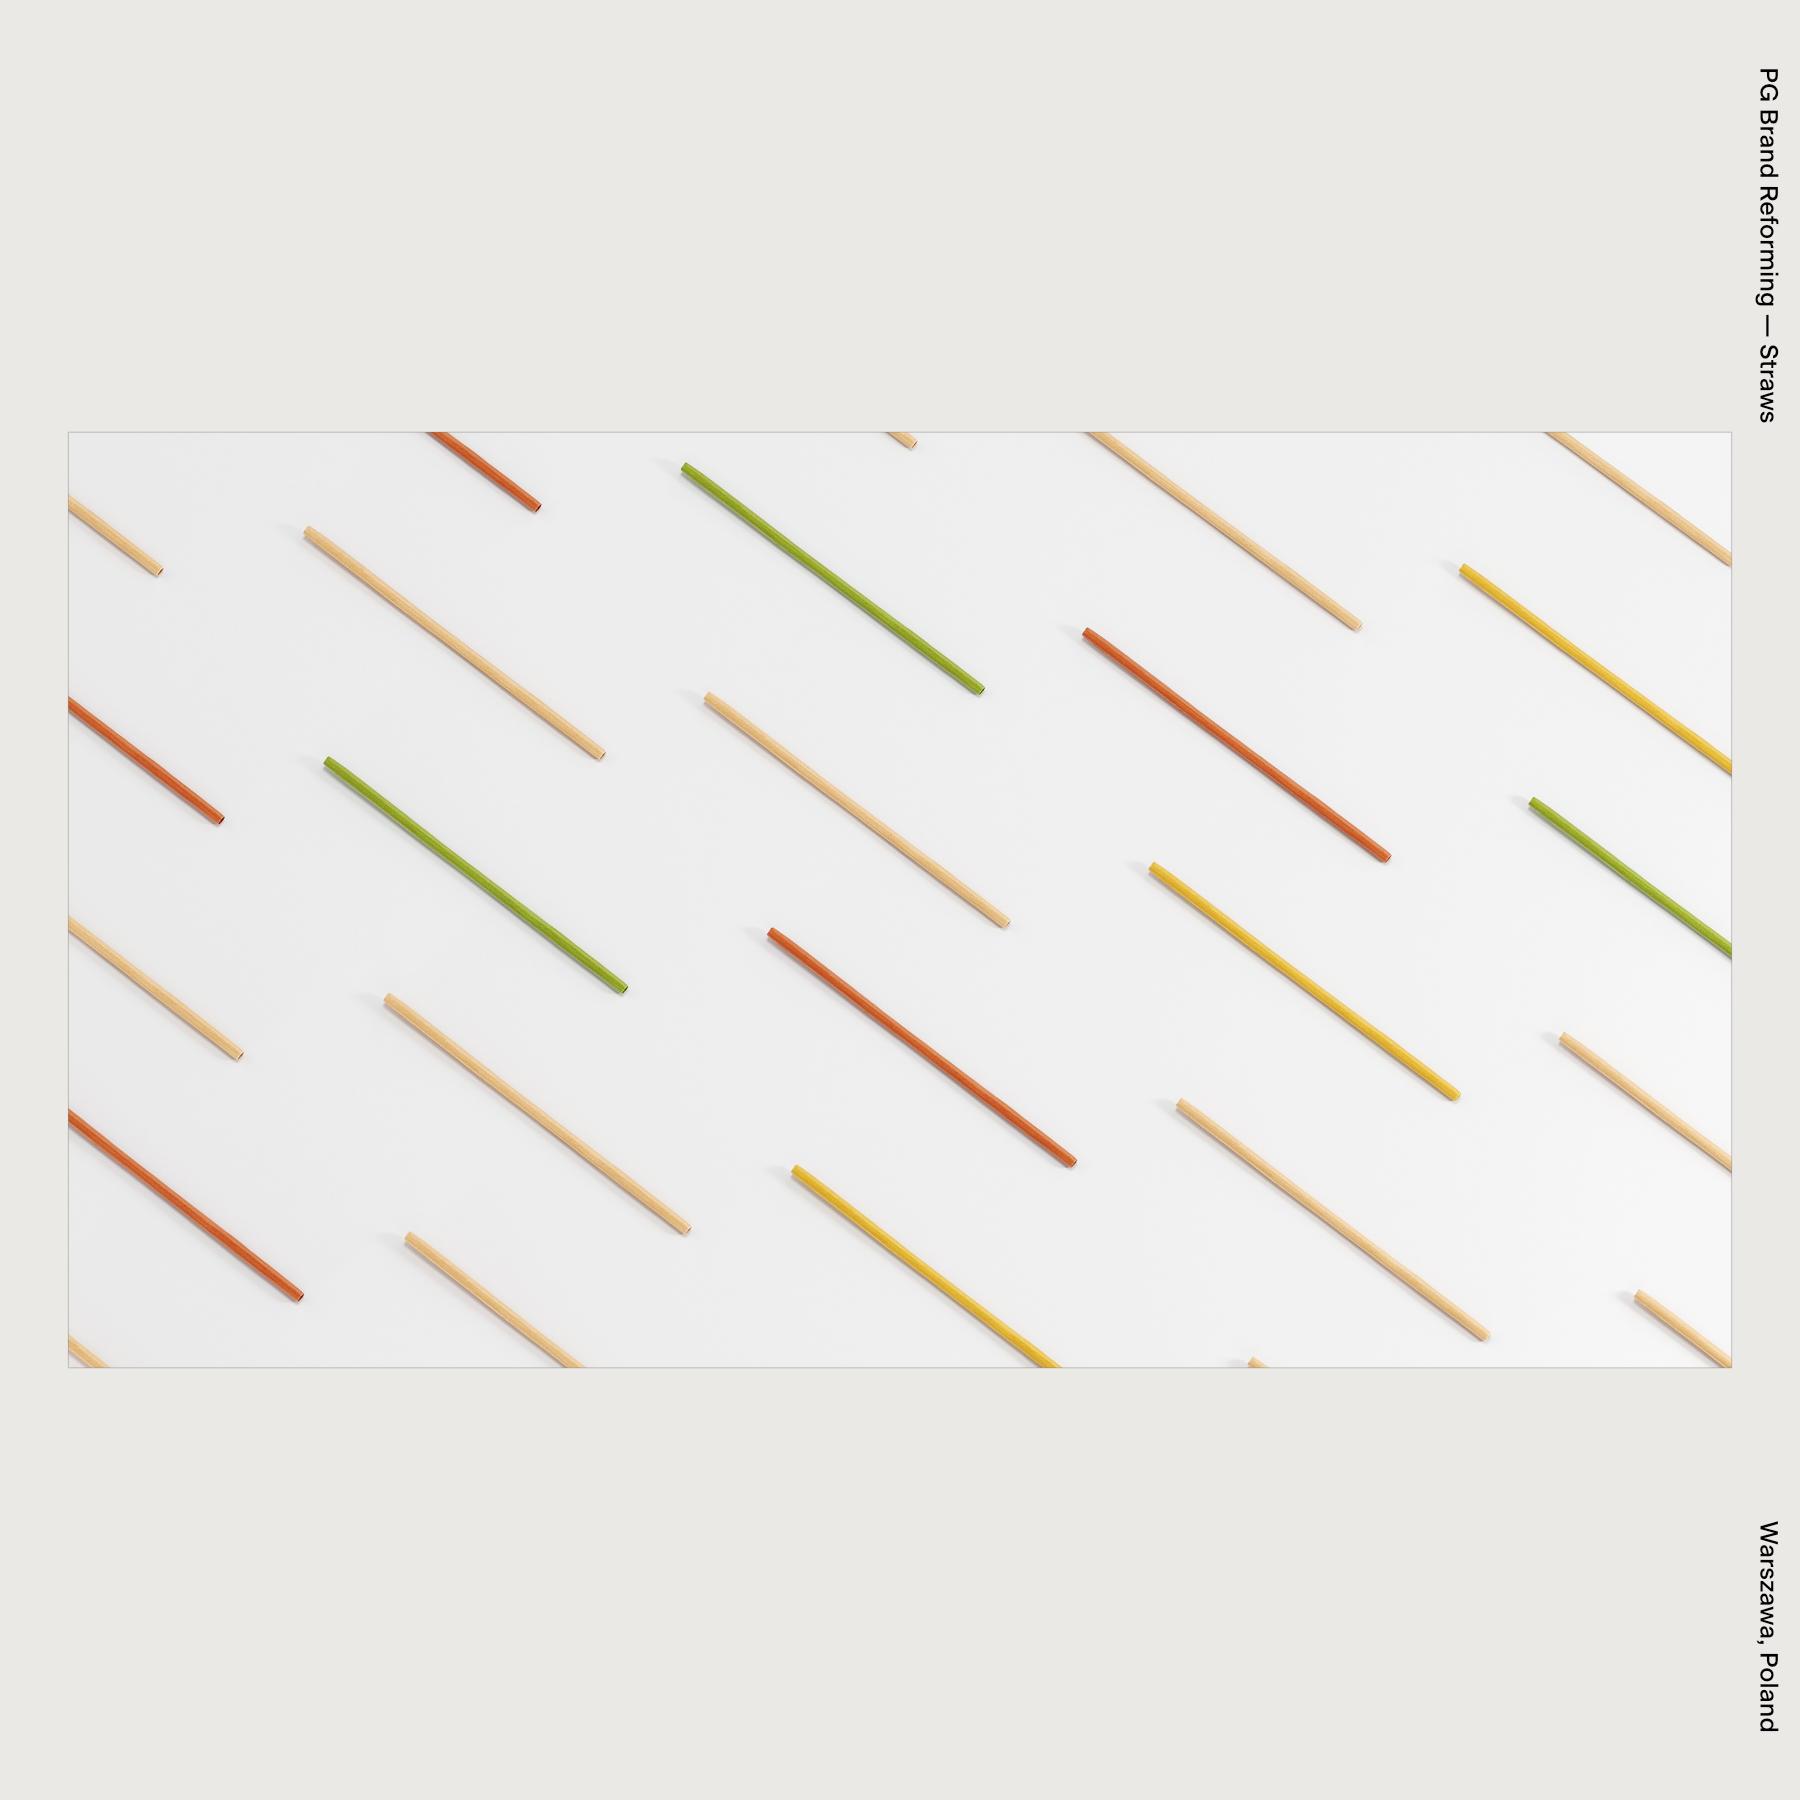 PG Brand Reforming — Straws